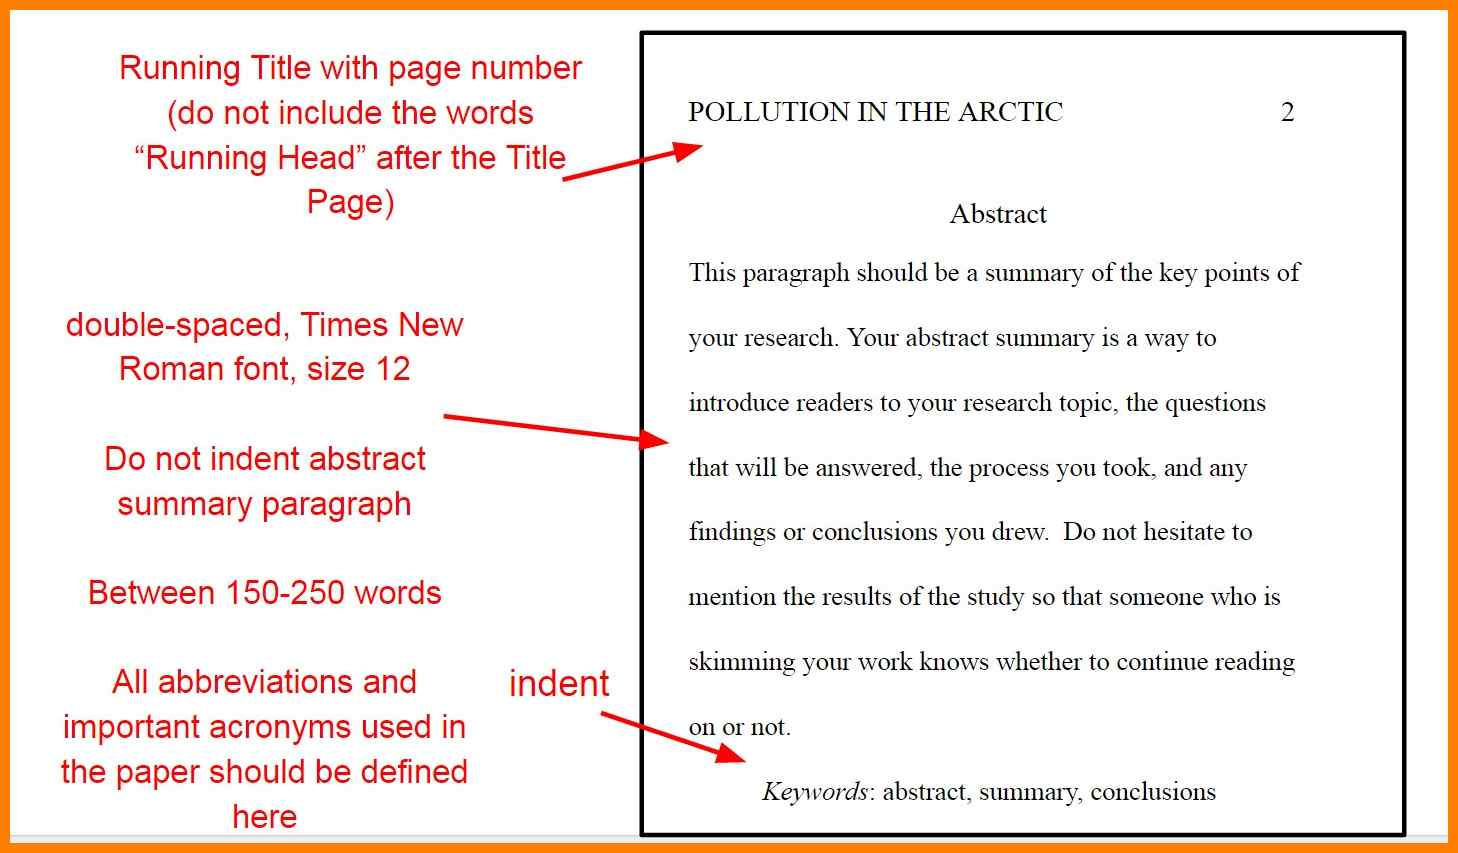 018 Apa Essay Format Apaabstractyo Font Size Stunning Formal Full